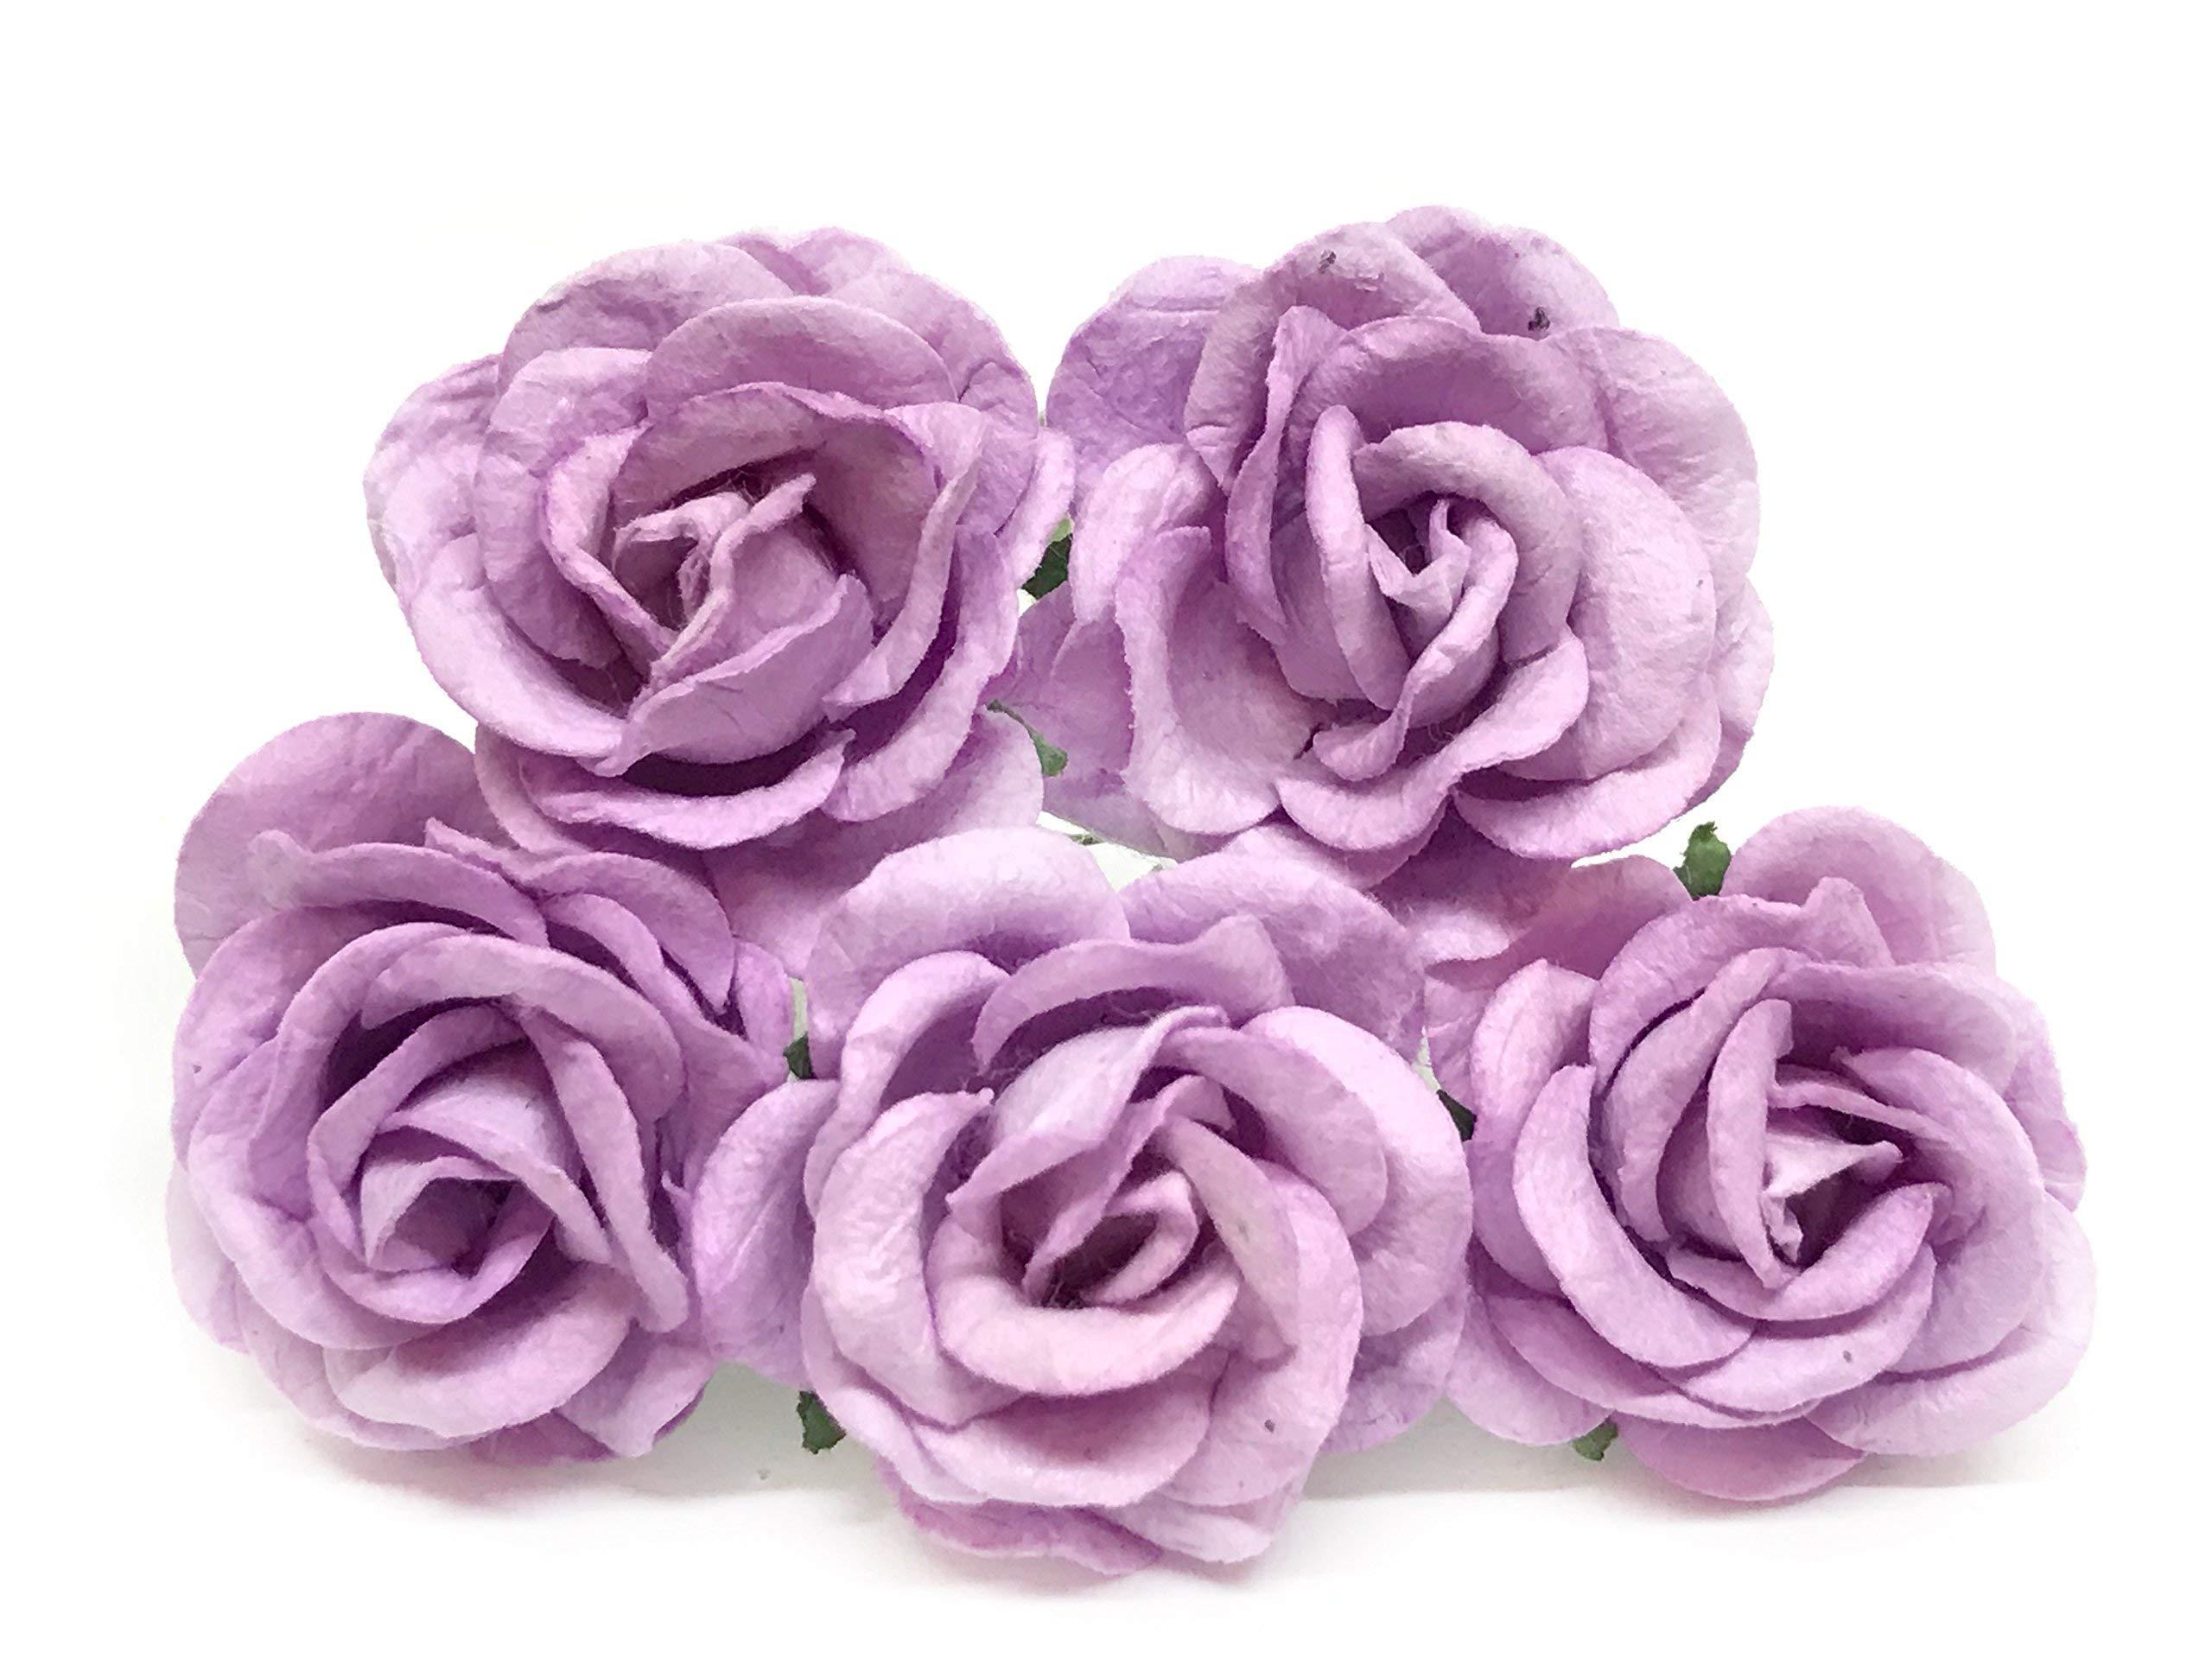 15-Lilac-Mulberry-Paper-Flowers-DIY-Wedding-Flowers-Bouquet-Purple-Paper-Roses-DIY-Wedding-Decor-DIY-Paper-Bouquet-Artificial-Flowers-Wedding-Crafts-Home-Decorations-12-Pieces